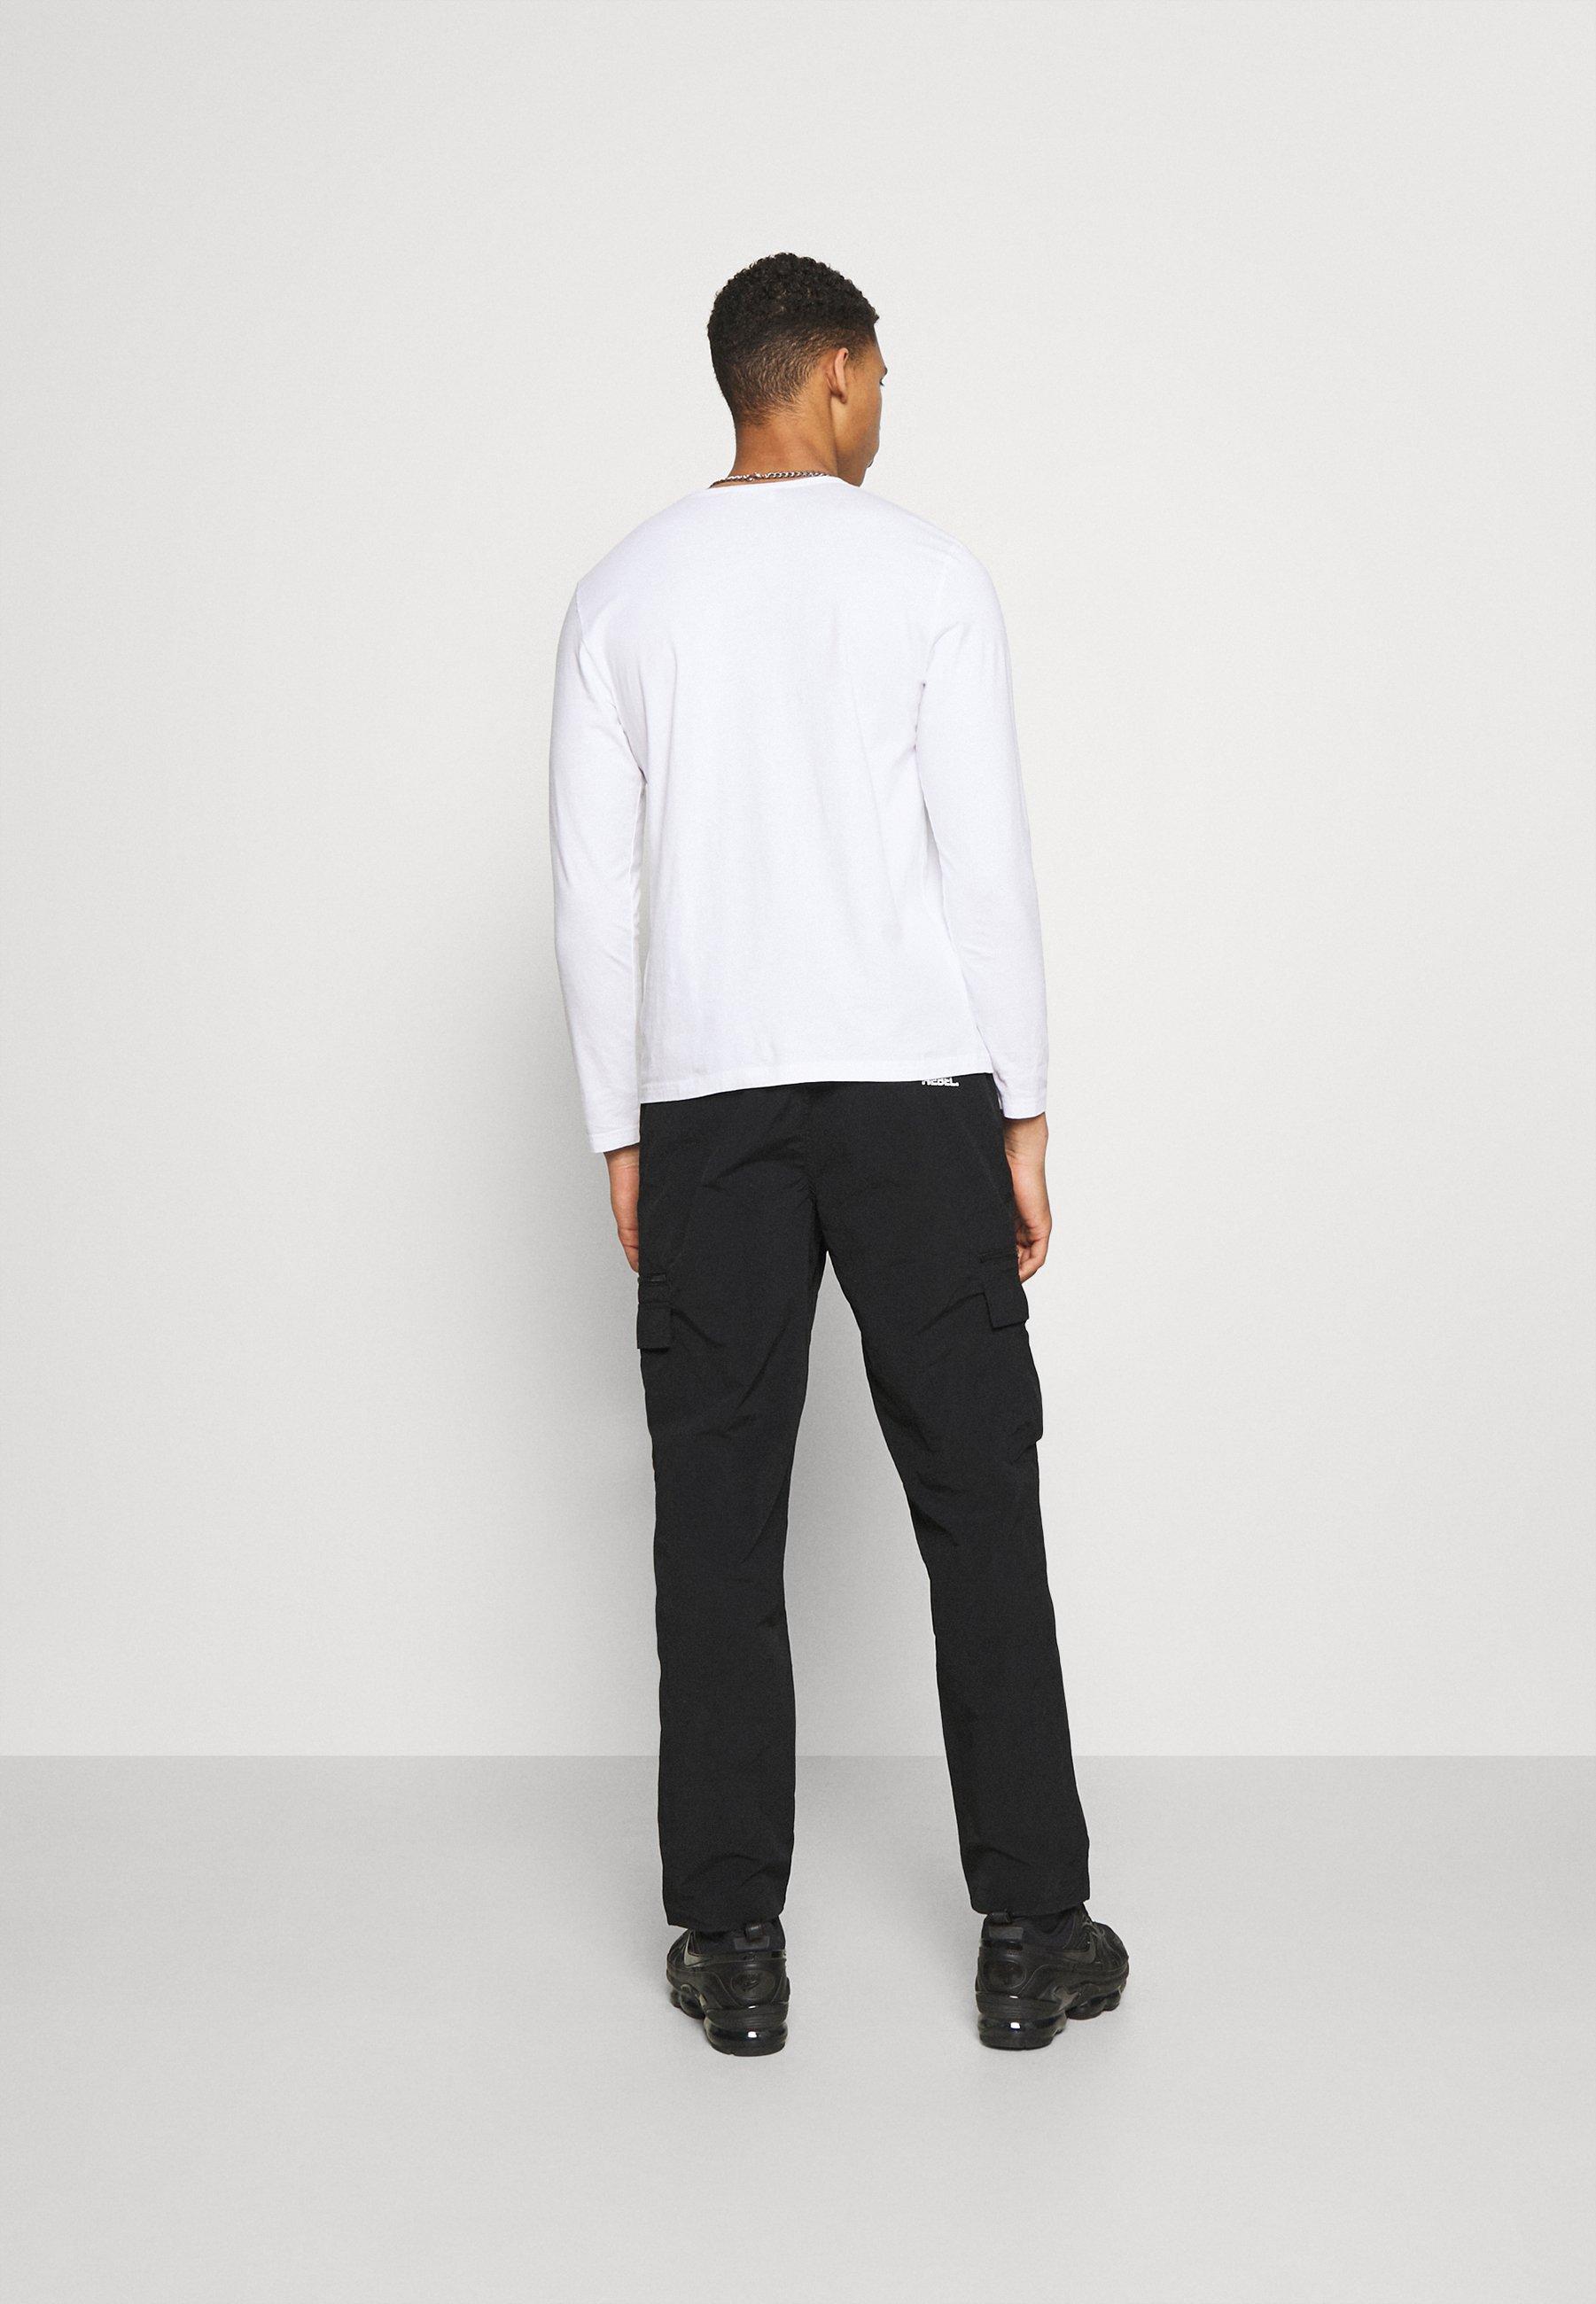 Homme SIMON PANTS - Pantalon cargo